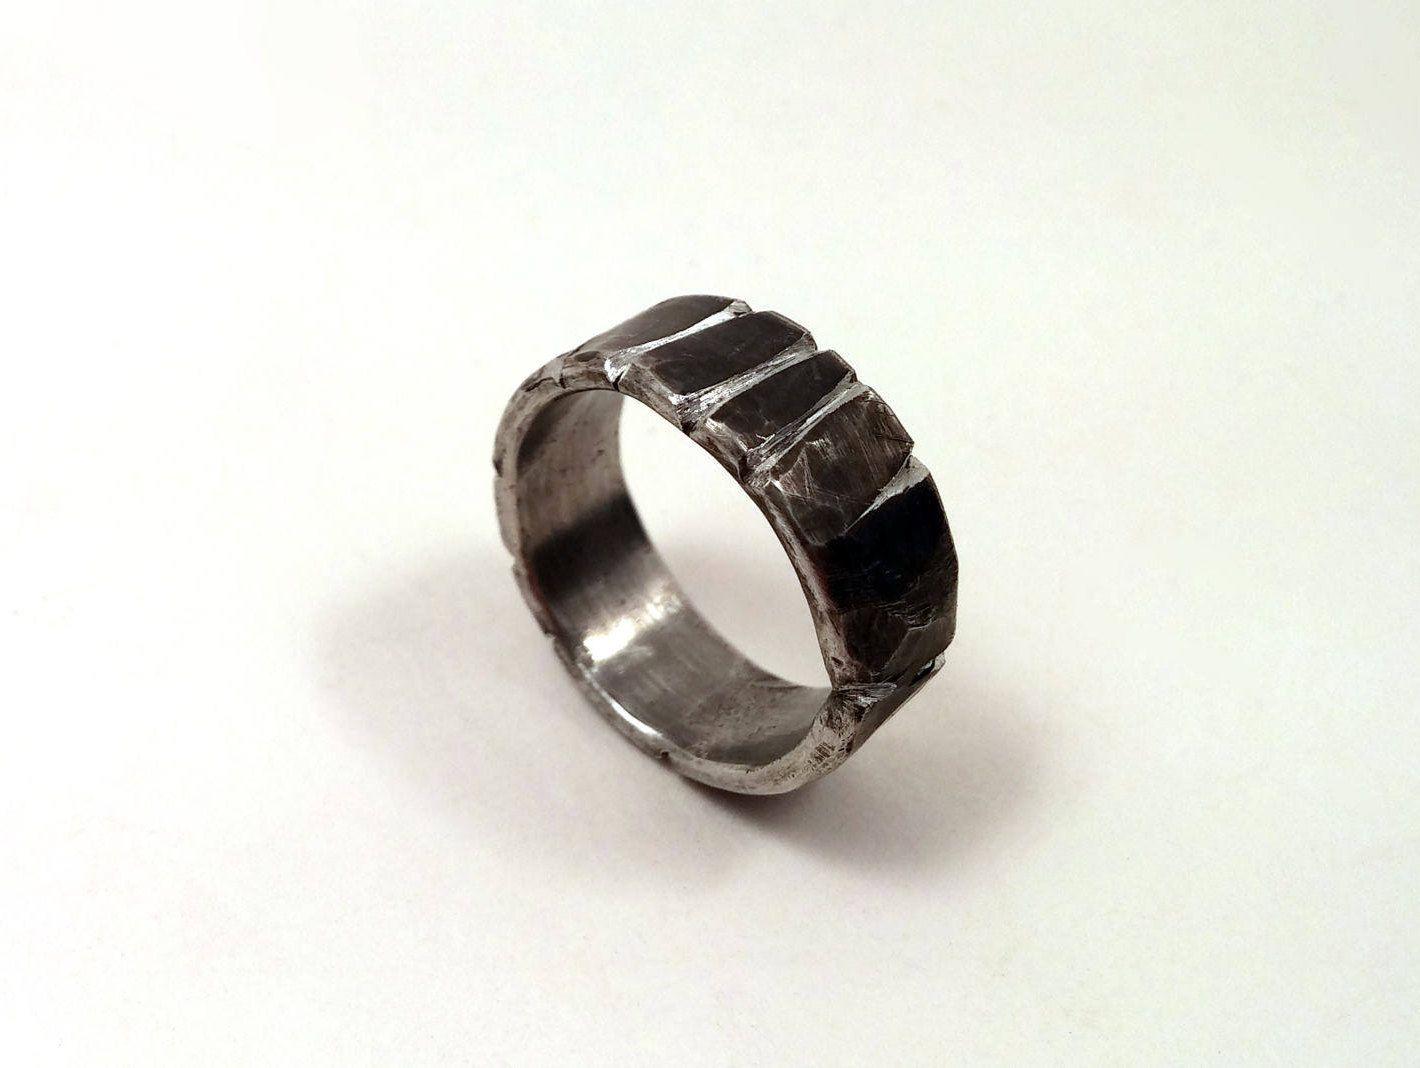 Men S Ancient Oxidized Viking Wedding Ring 8 12mm Etsy Viking Wedding Ring Sterling Silver Wedding Rings Wedding Rings